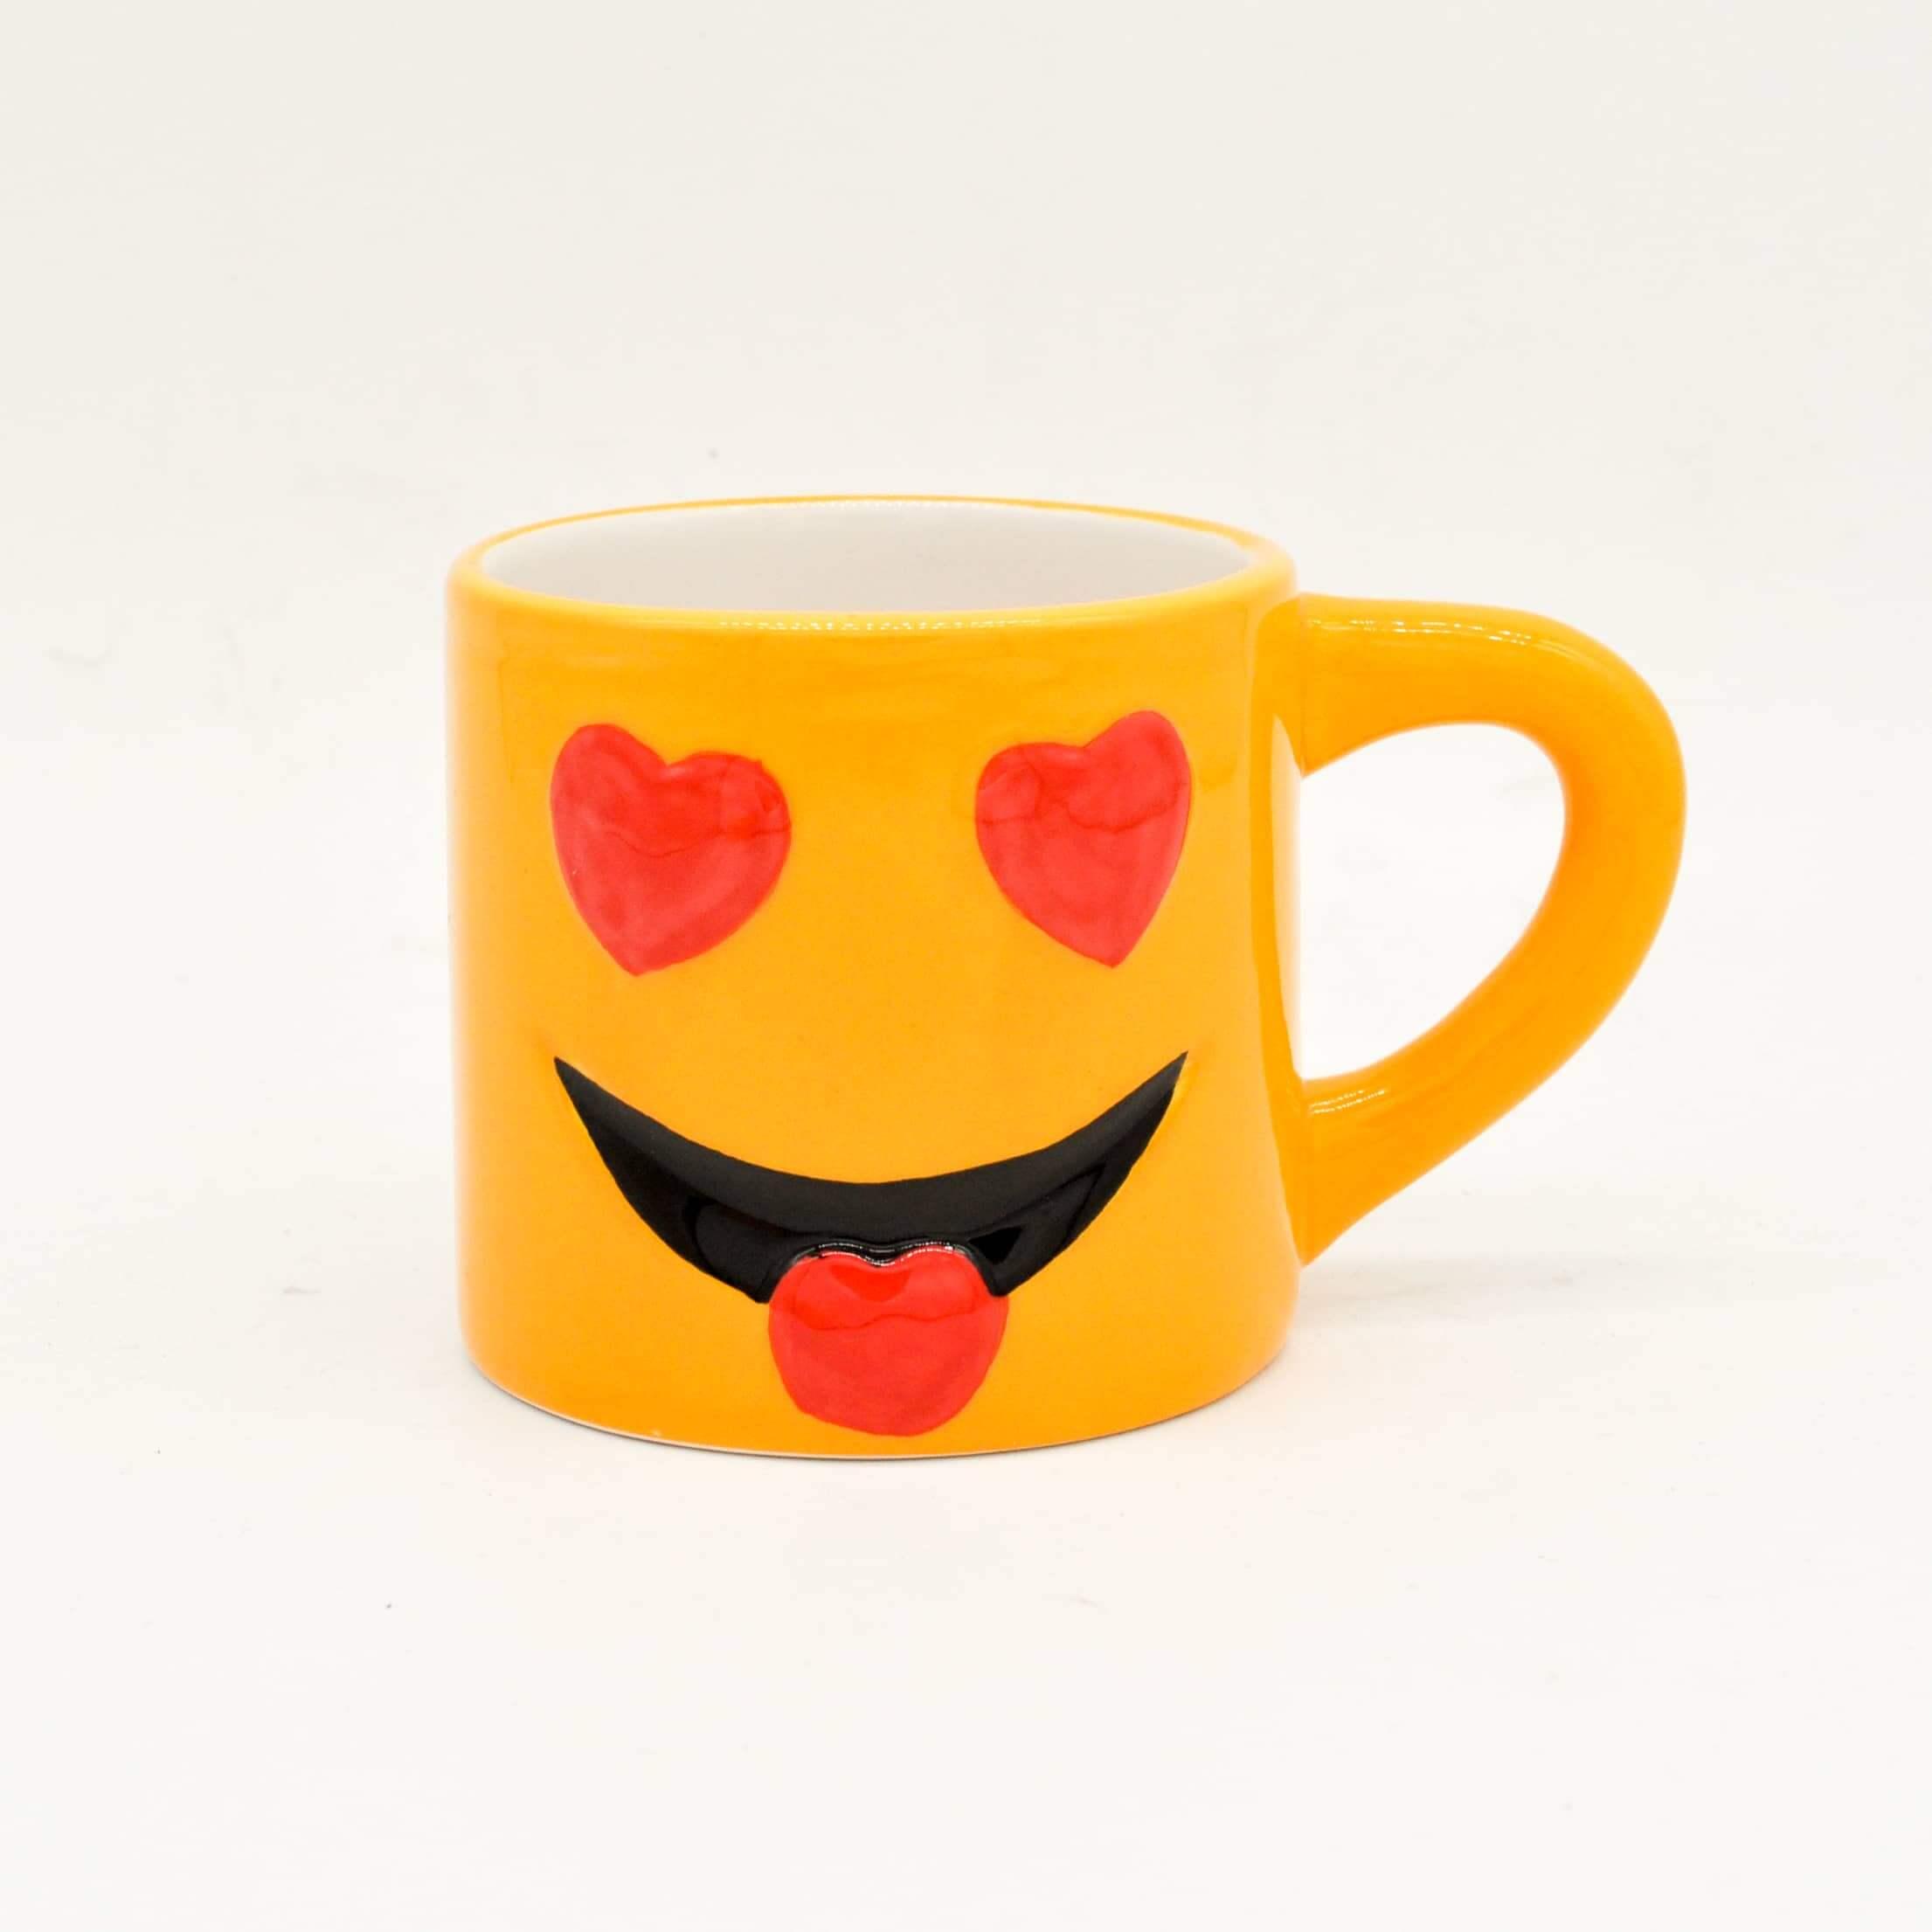 8oz Emoji Coffee Mug Yongchuan Ceramics Co Ltd